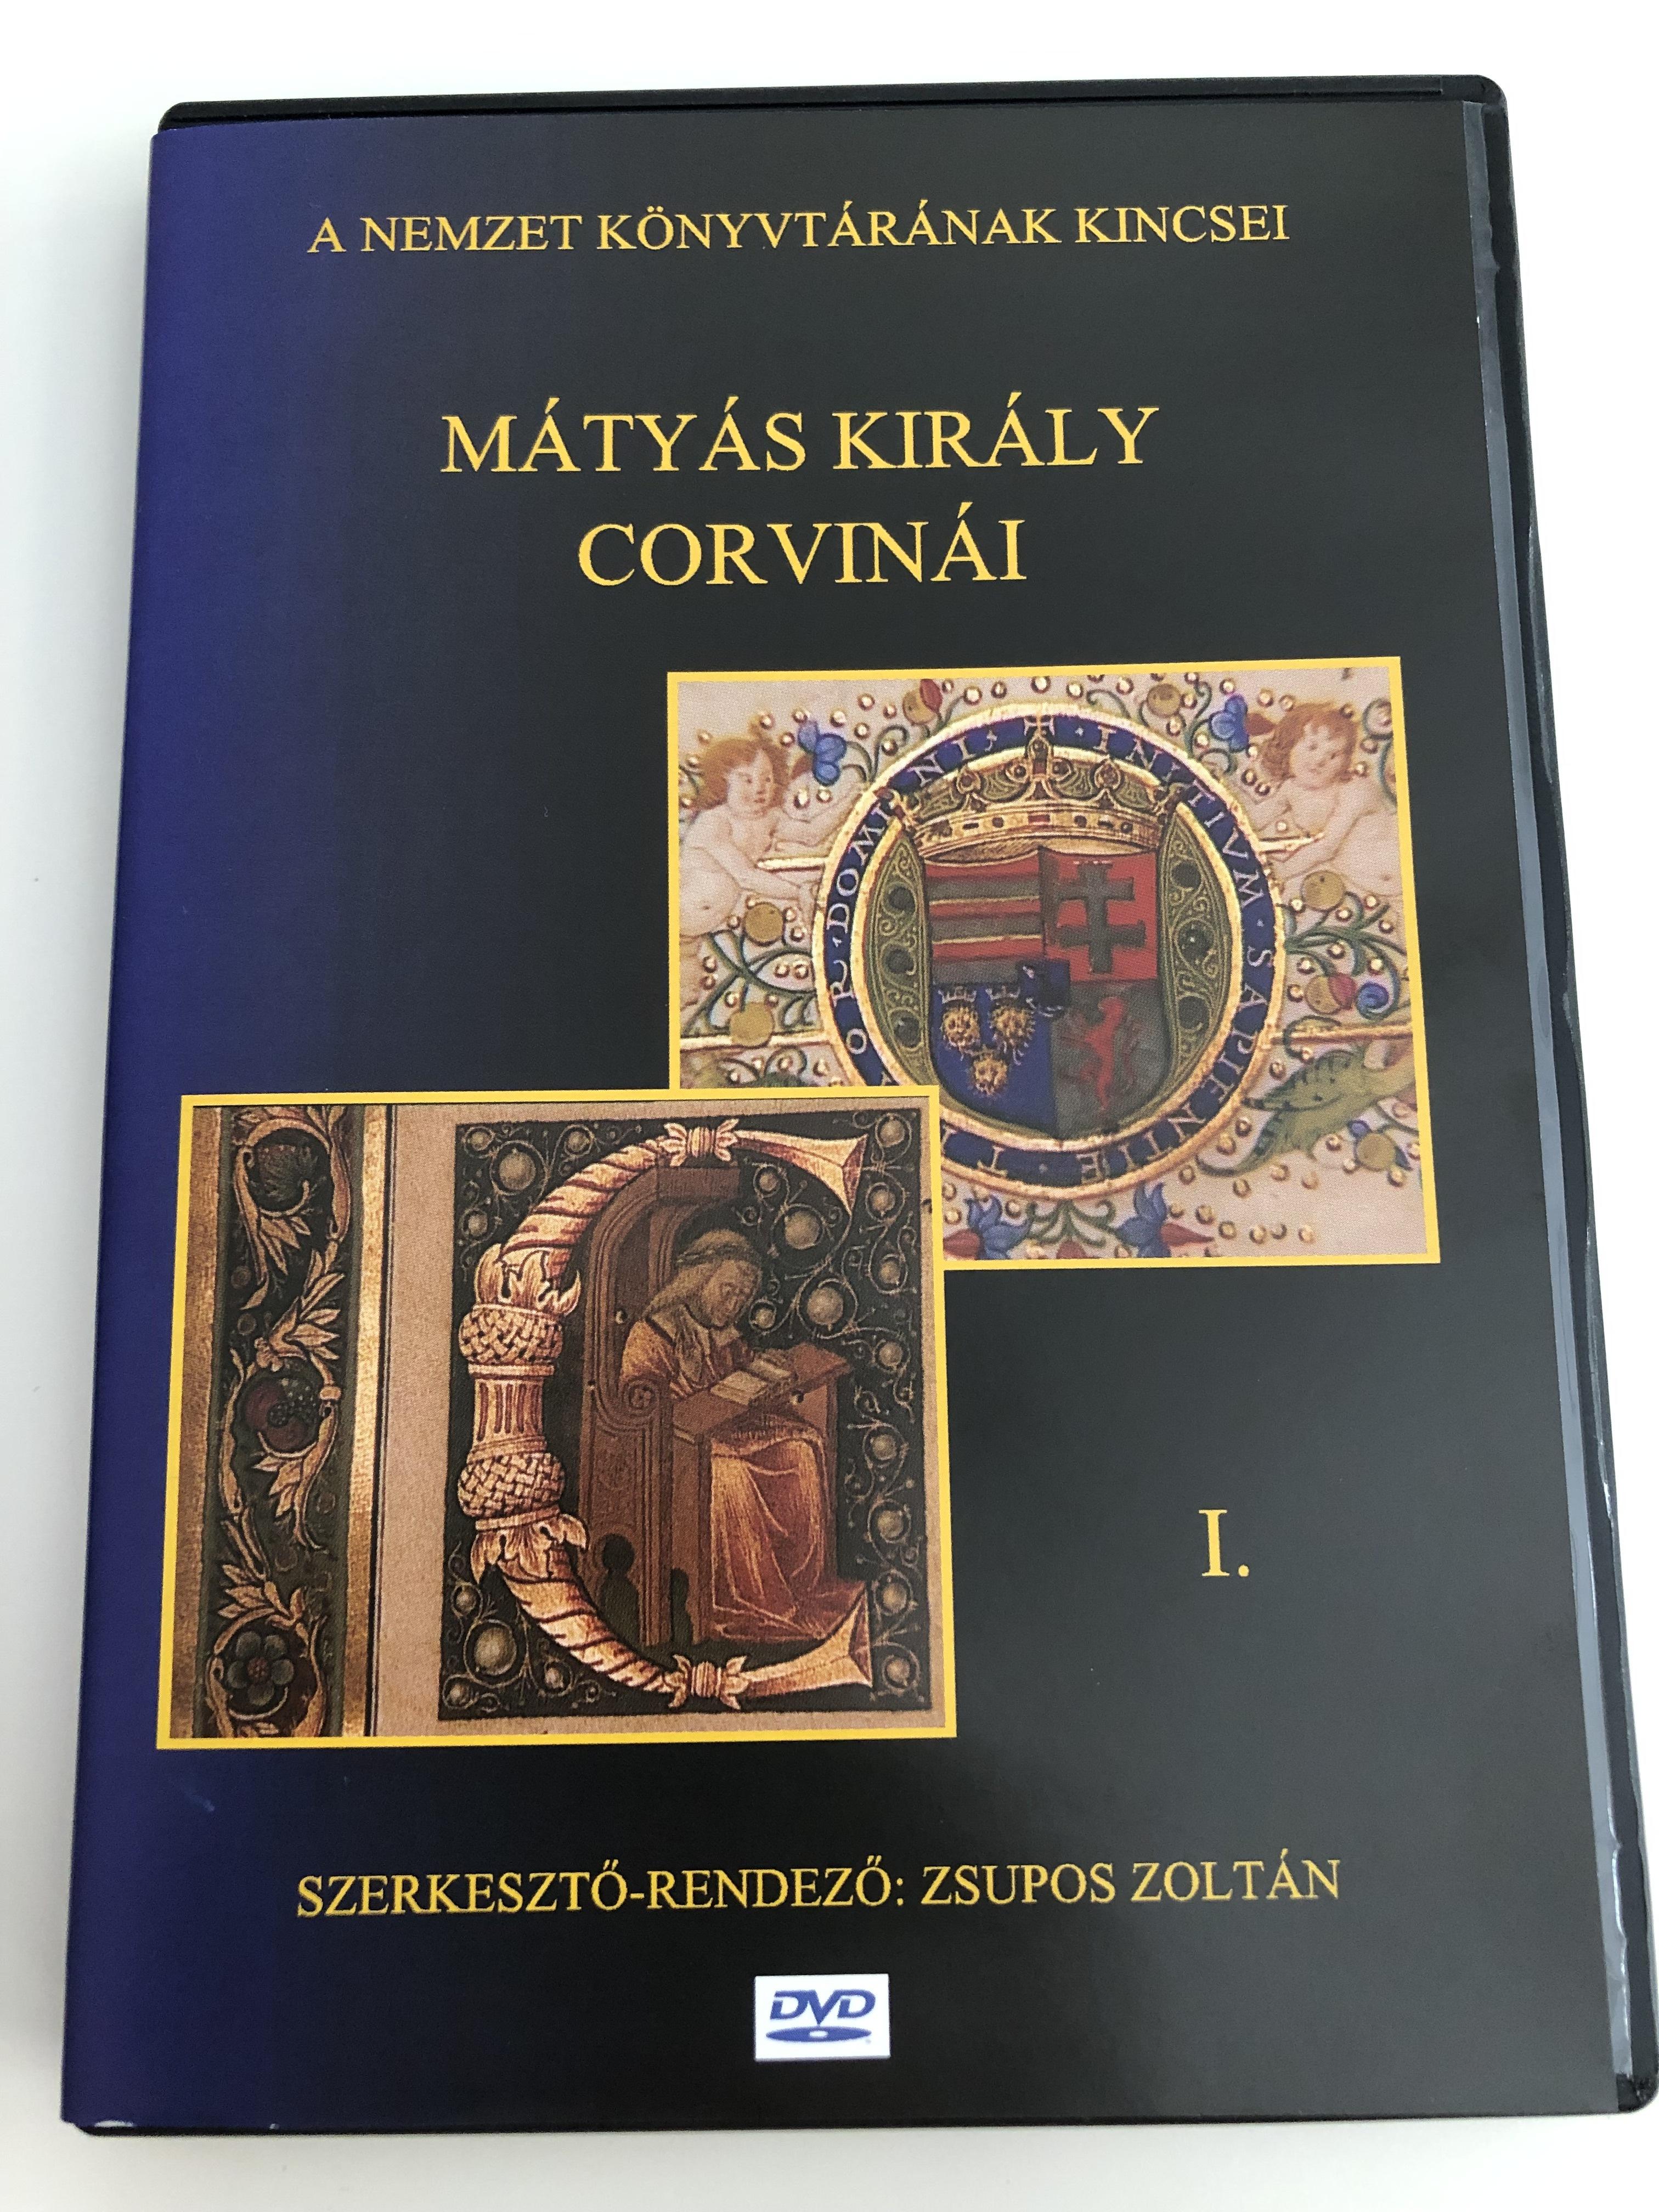 m-ty-s-kir-ly-corvin-i-i.-dvd-a-nemzet-k-nyvt-r-nak-kincsei-directed-by-zsupos-zolt-n-hungarian-king-matthias-bibliotheca-corviniana-1-.jpg